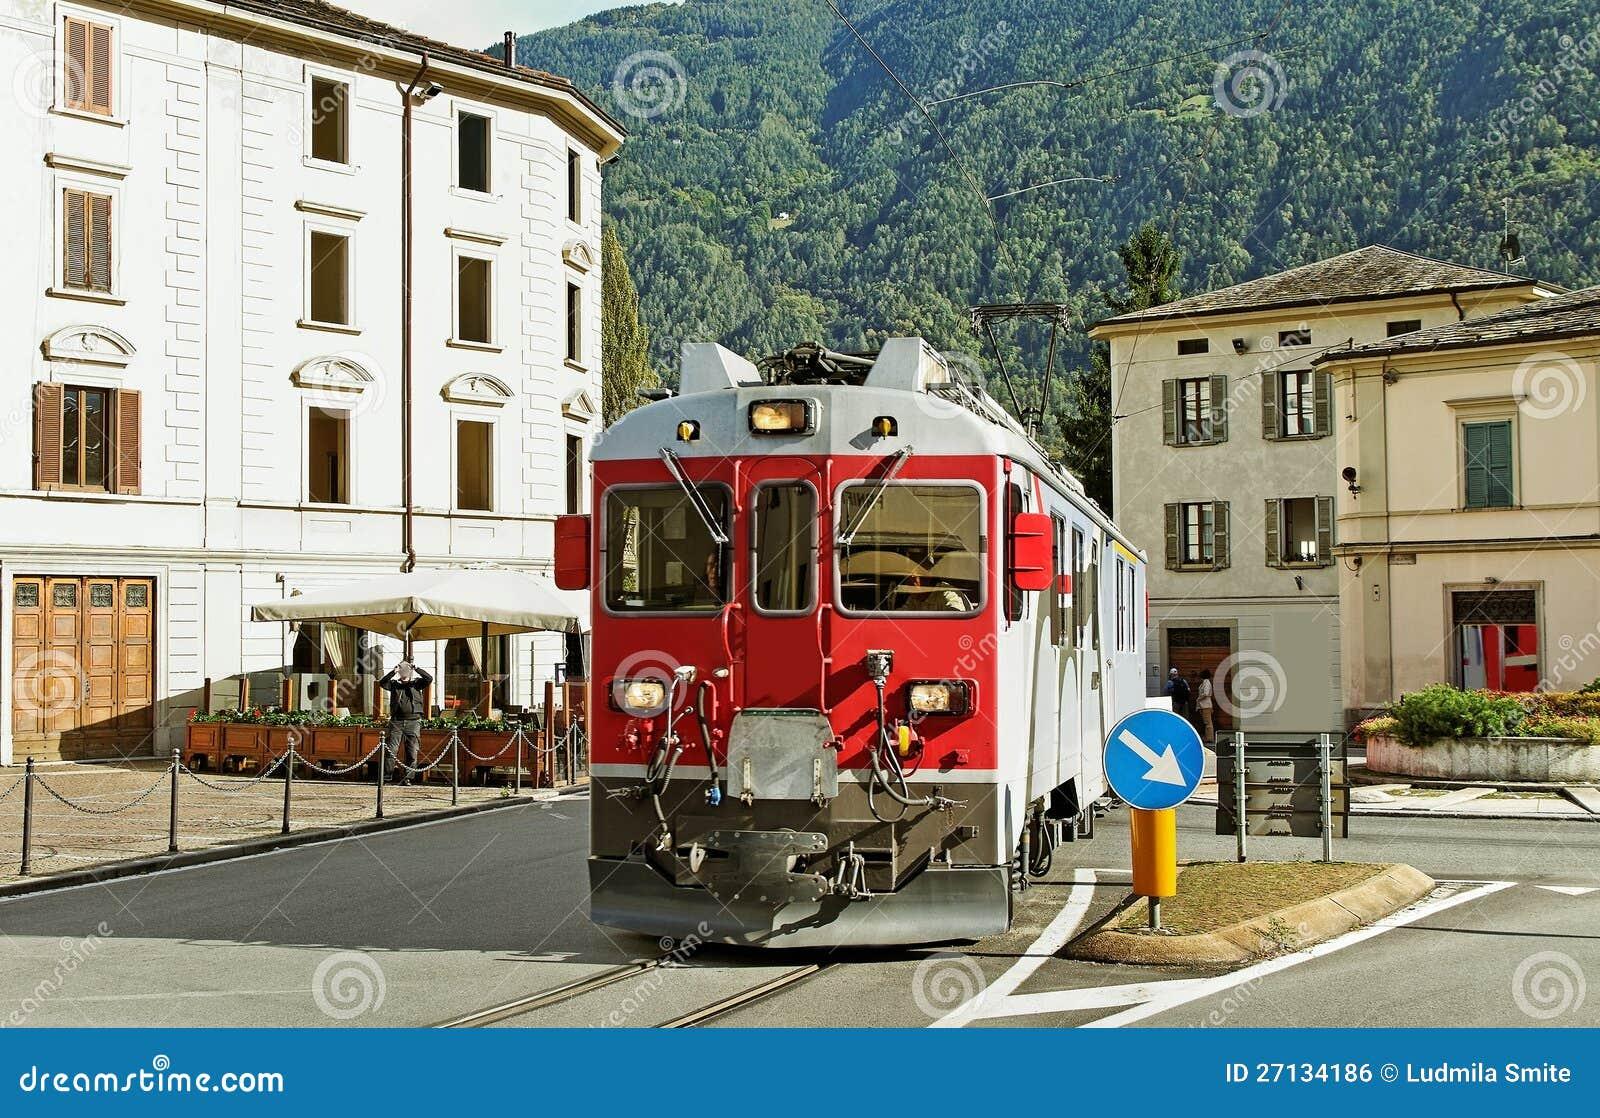 Train on the street.